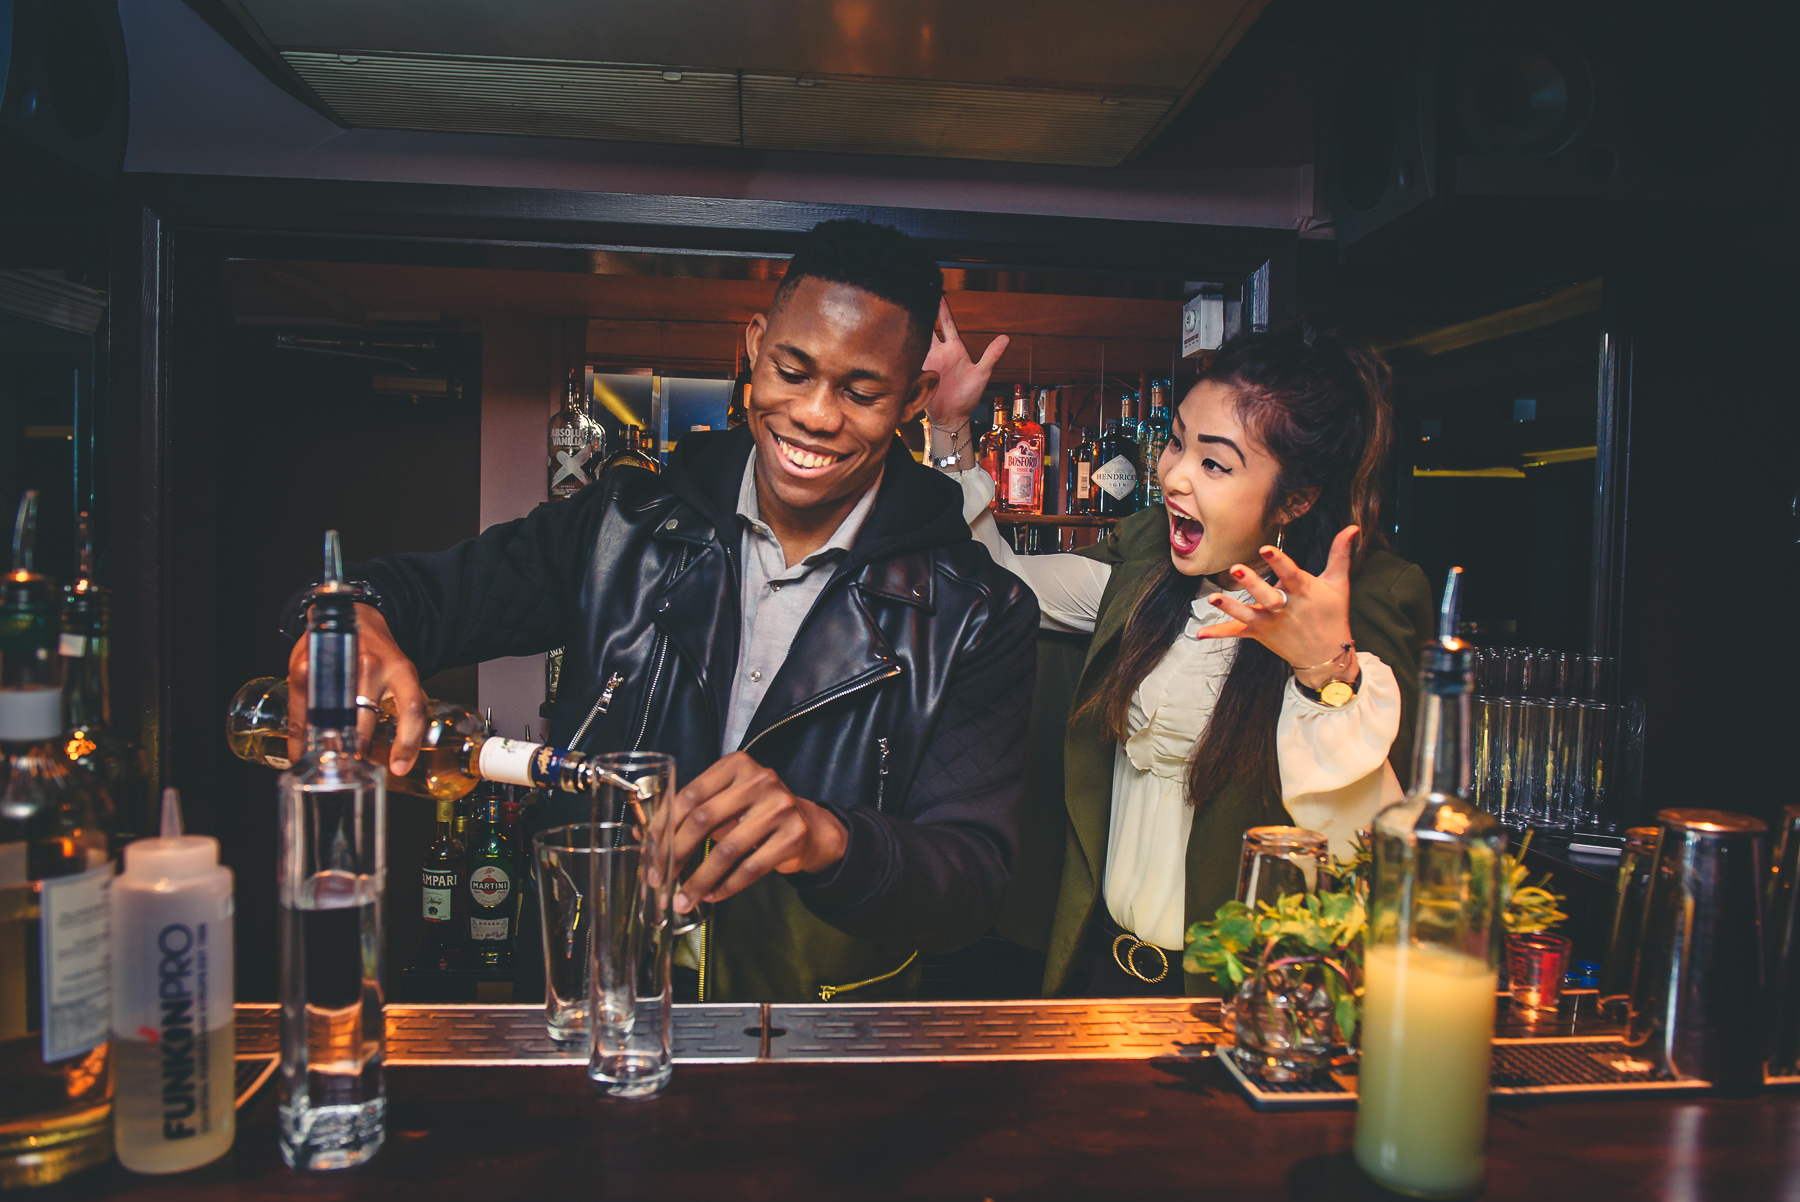 Angels cocktail bar Oxford 19.01.2019-34.jpg